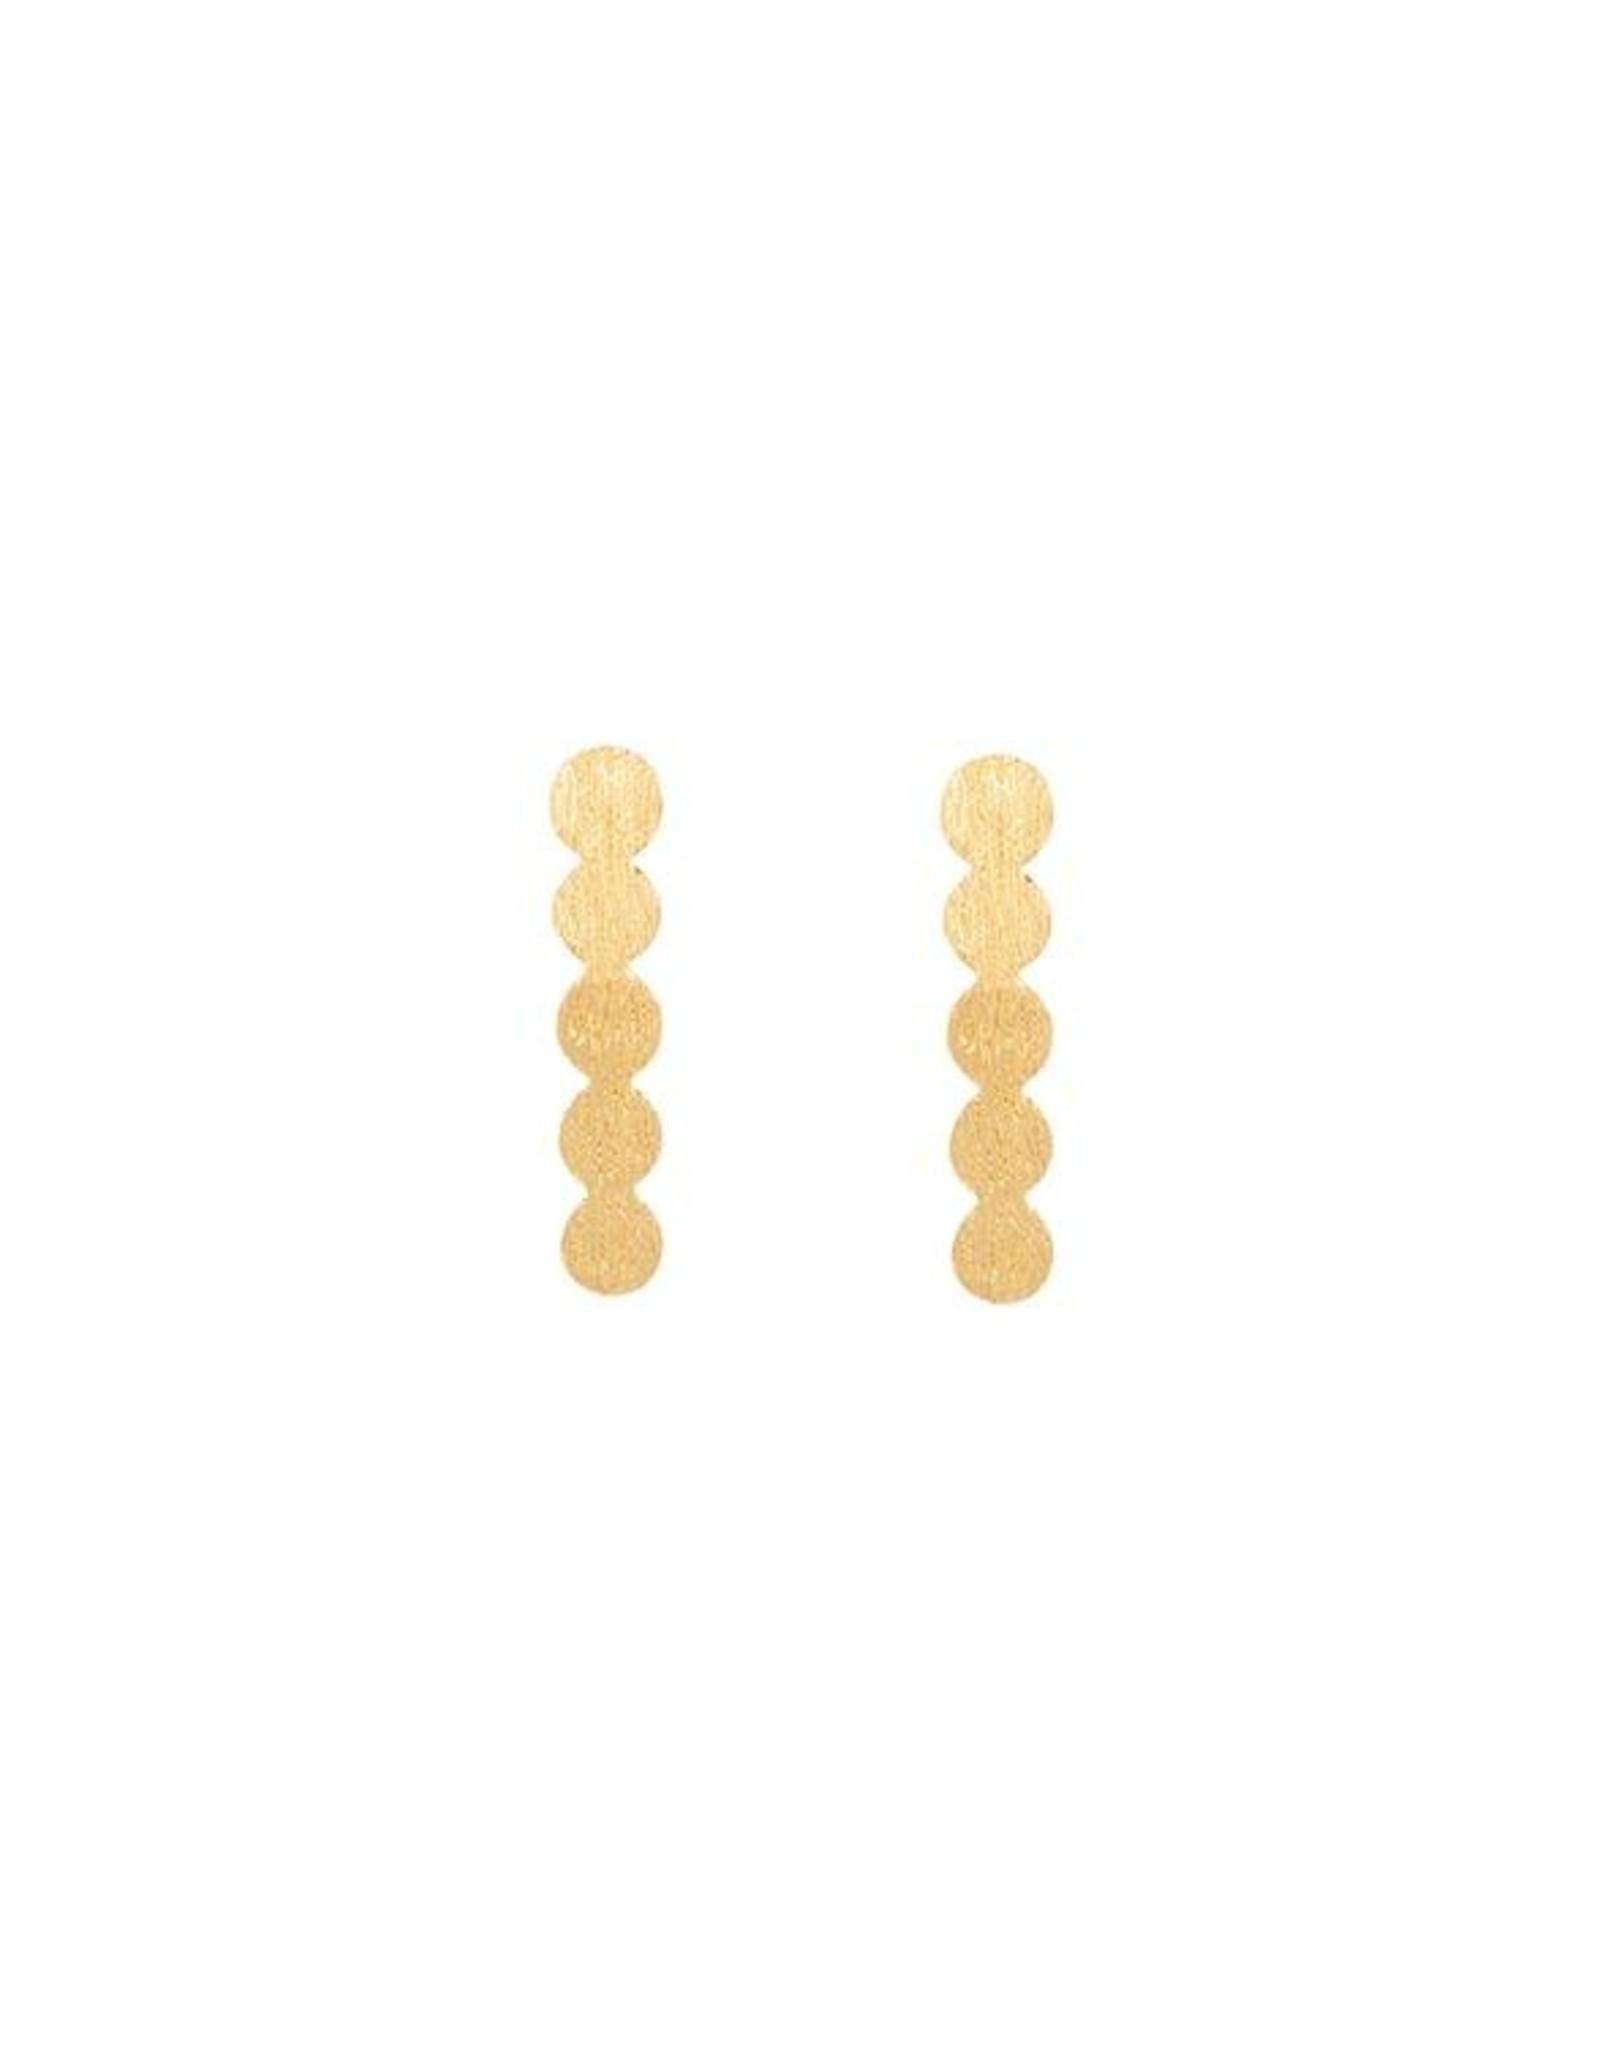 Ohrstecker Disc Line 925 Silber vergoldet